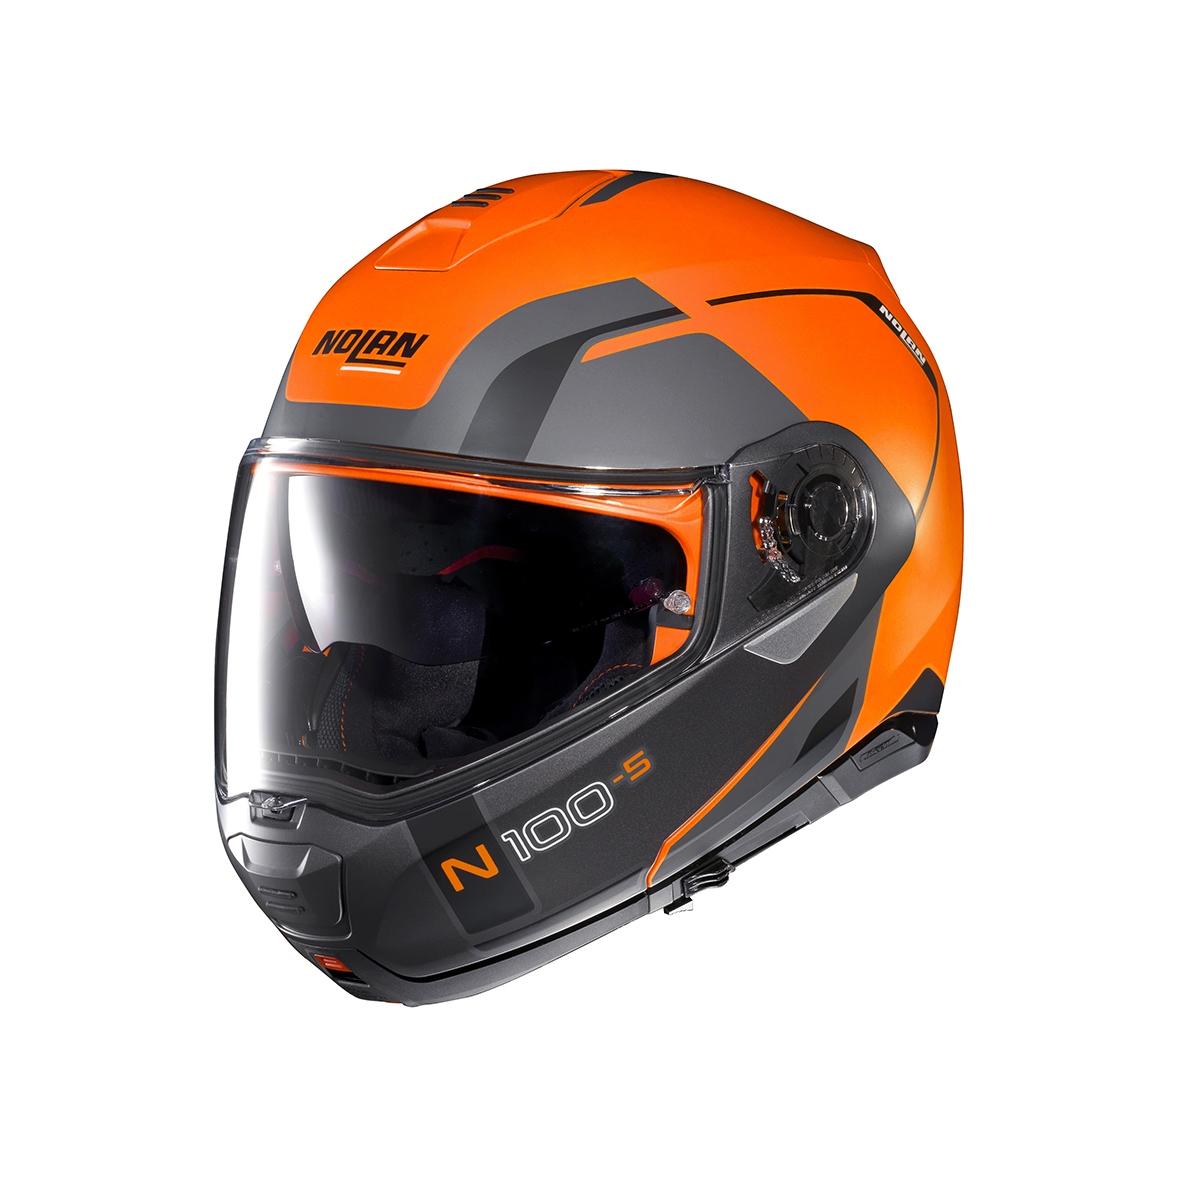 Moto helma Nolan N100-5 Consistency N-Com Flat Led Orange 27